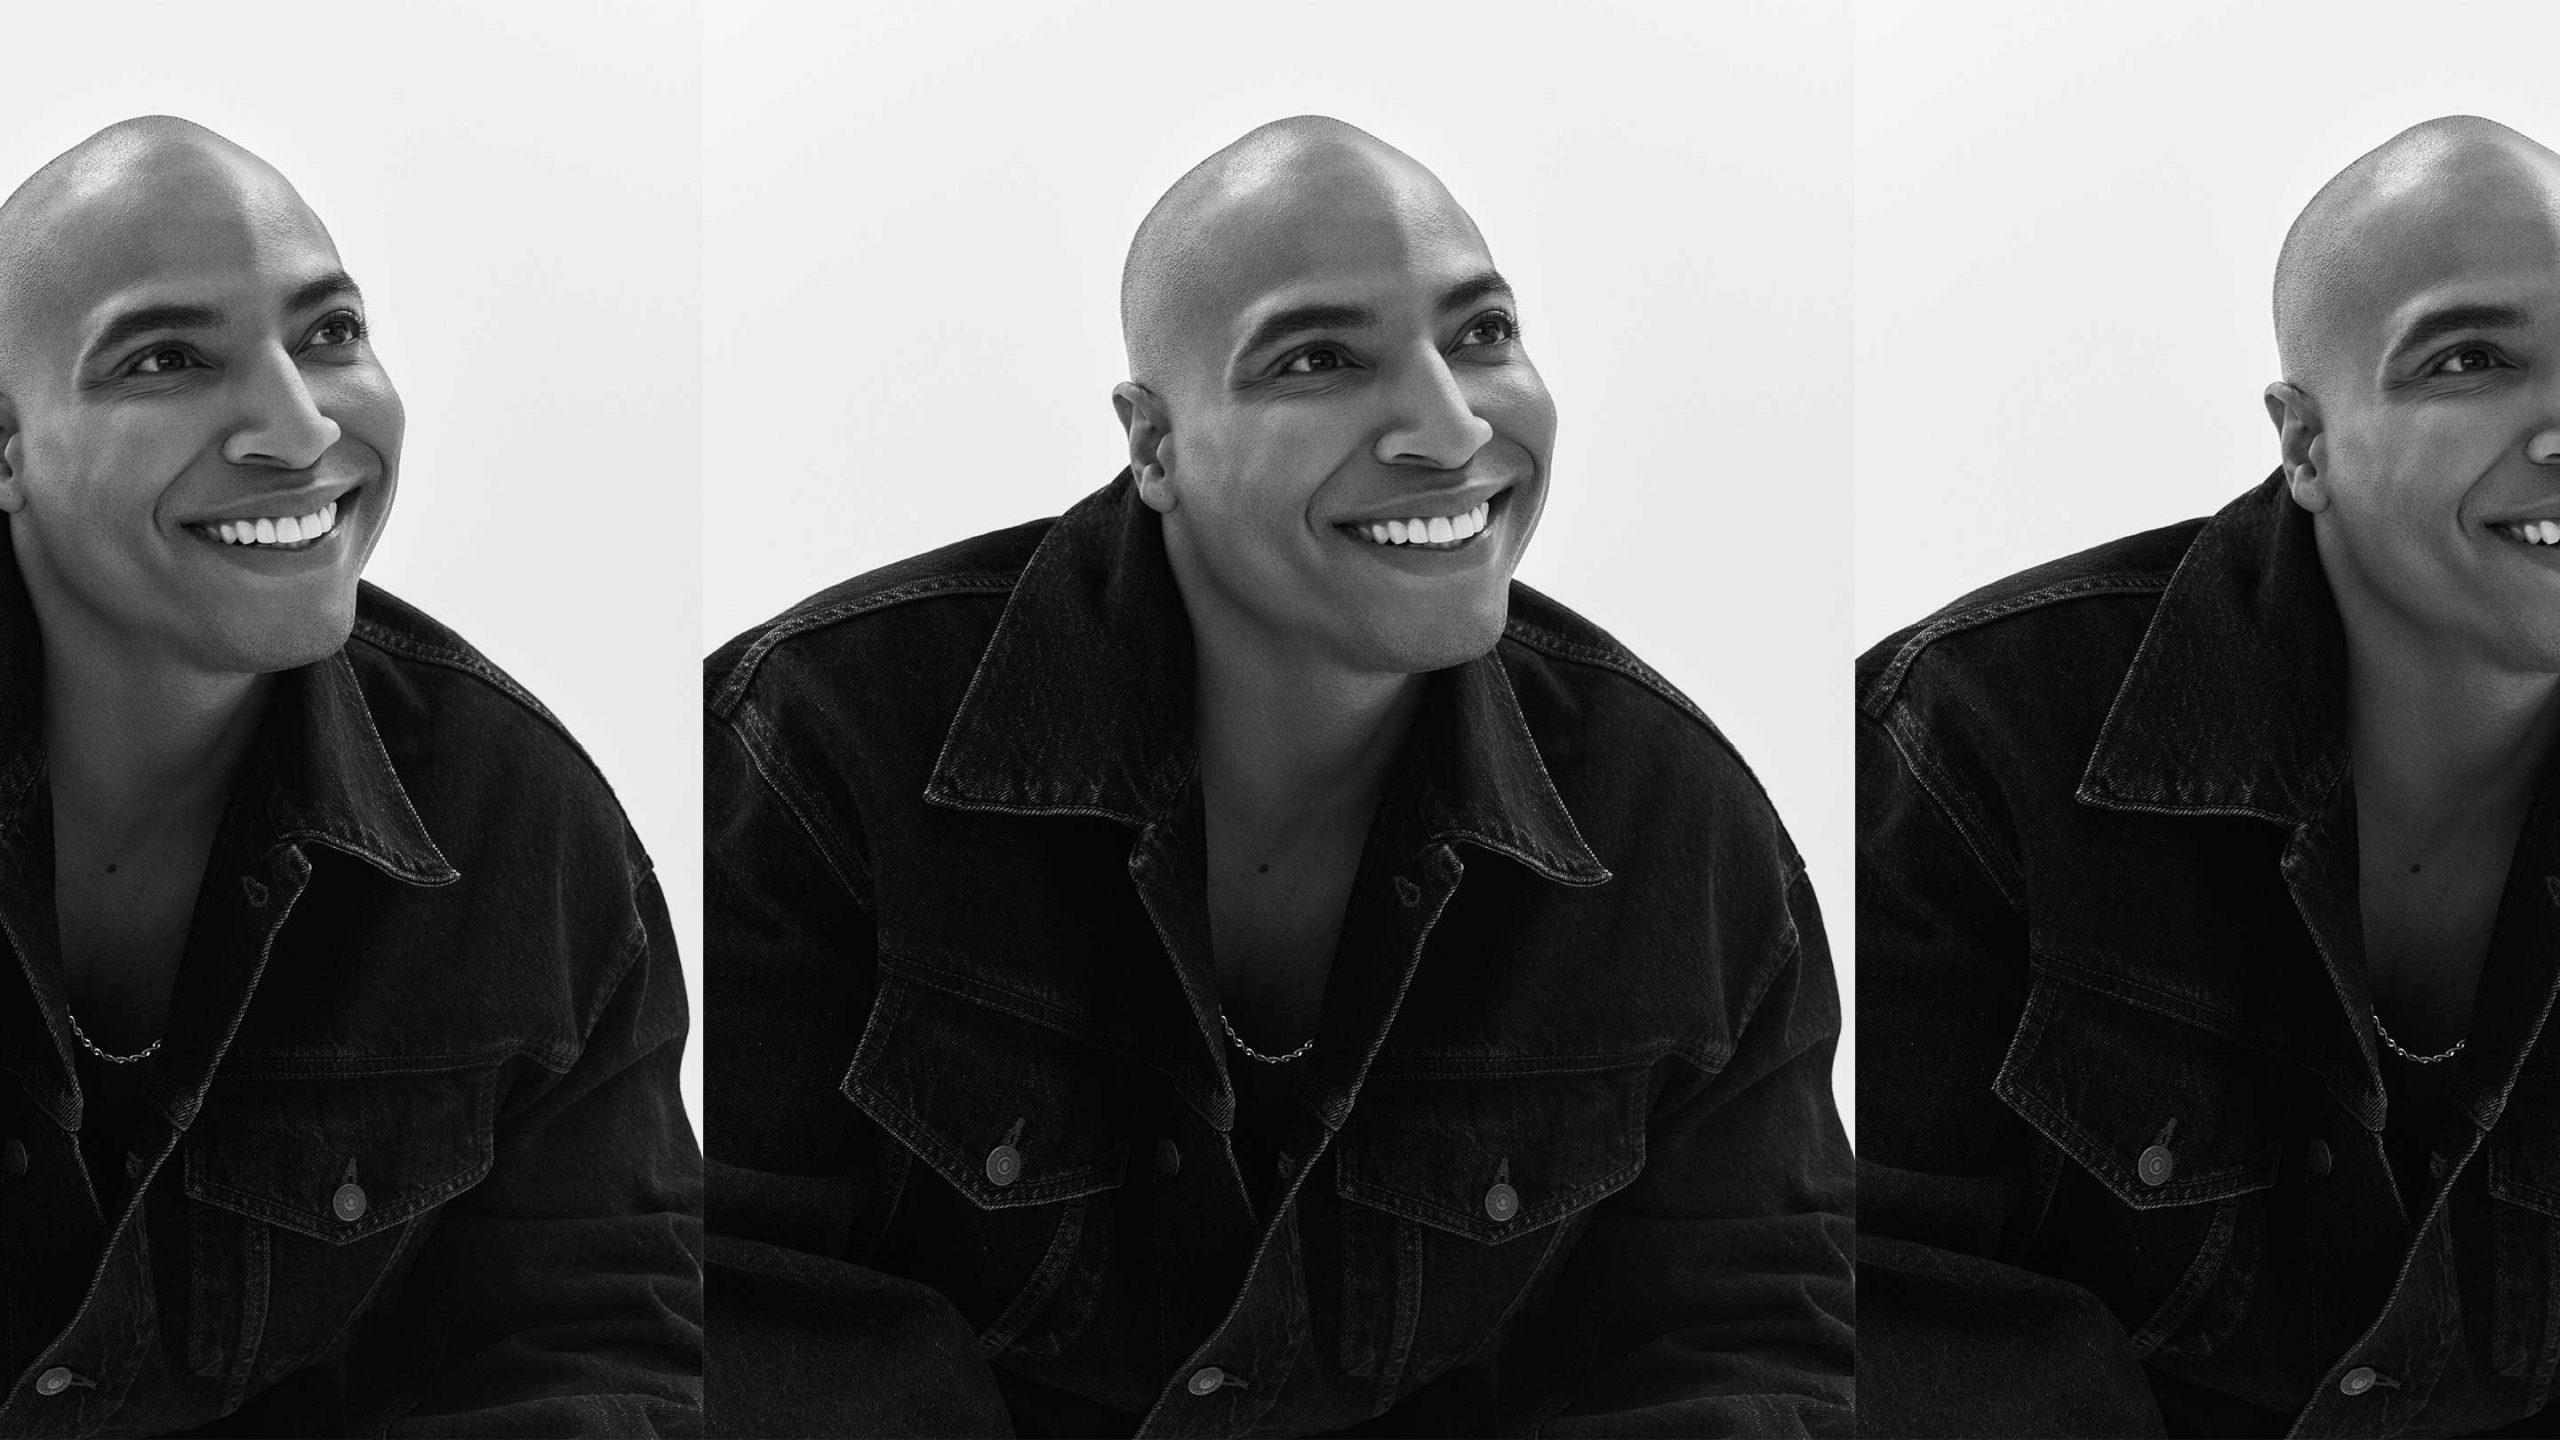 Meet Buttah Skin's Founder Dorión Renaud